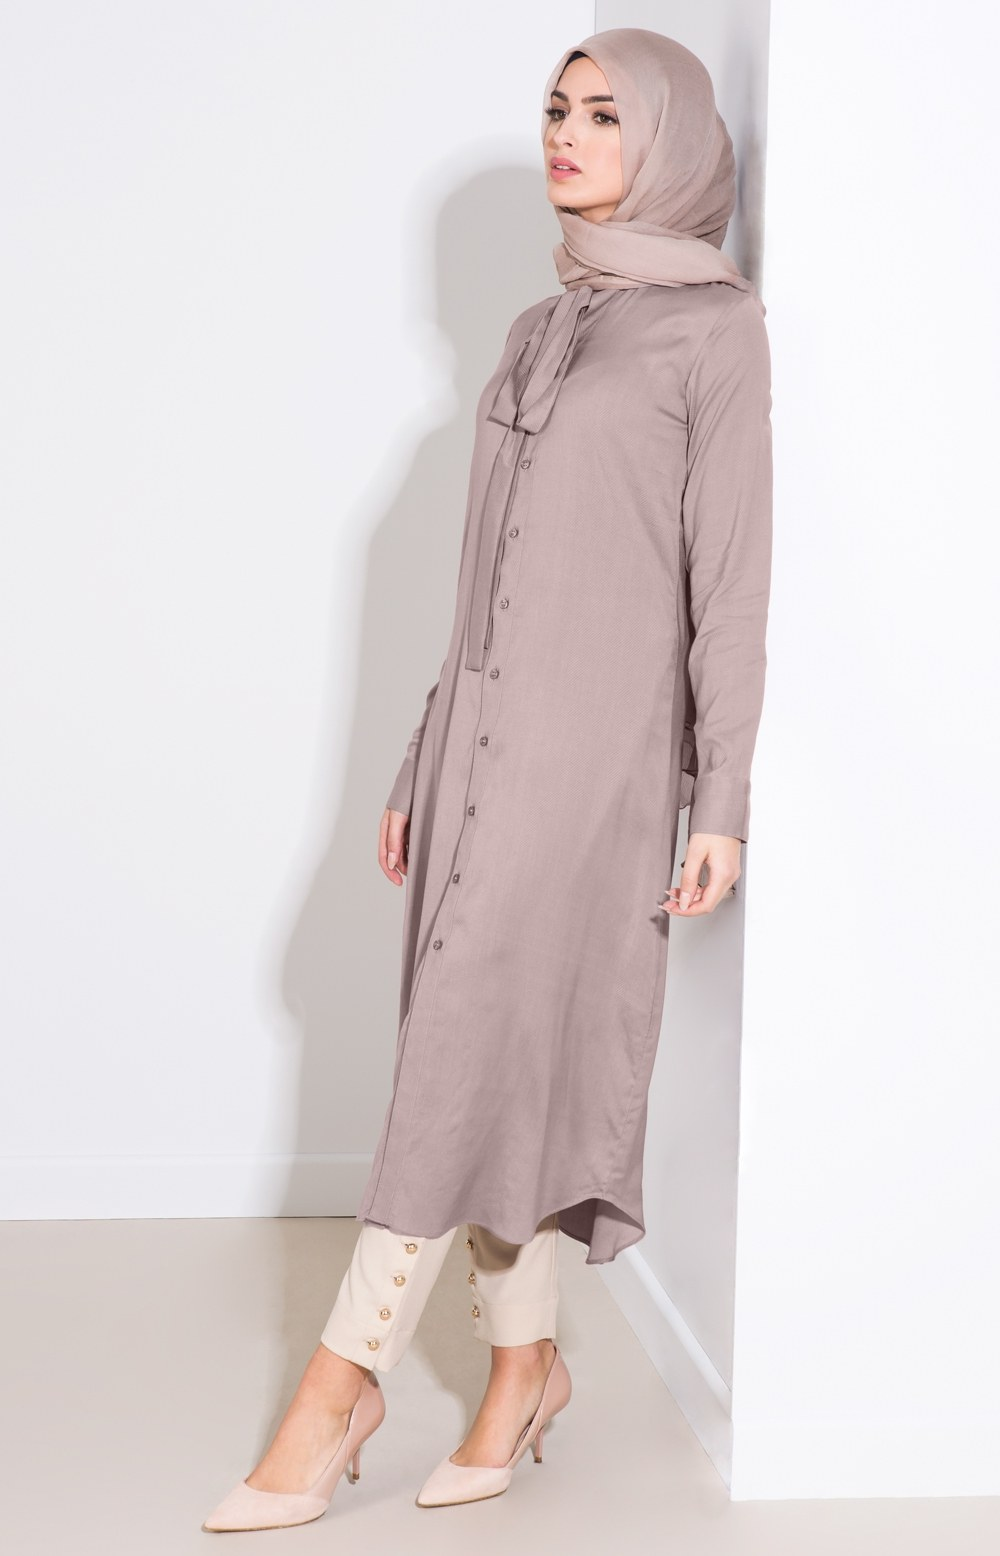 Ide Baju Lebaran Yang Terbaru Zwd9 25 Trend Model Baju Muslim Lebaran 2018 Simple & Modis